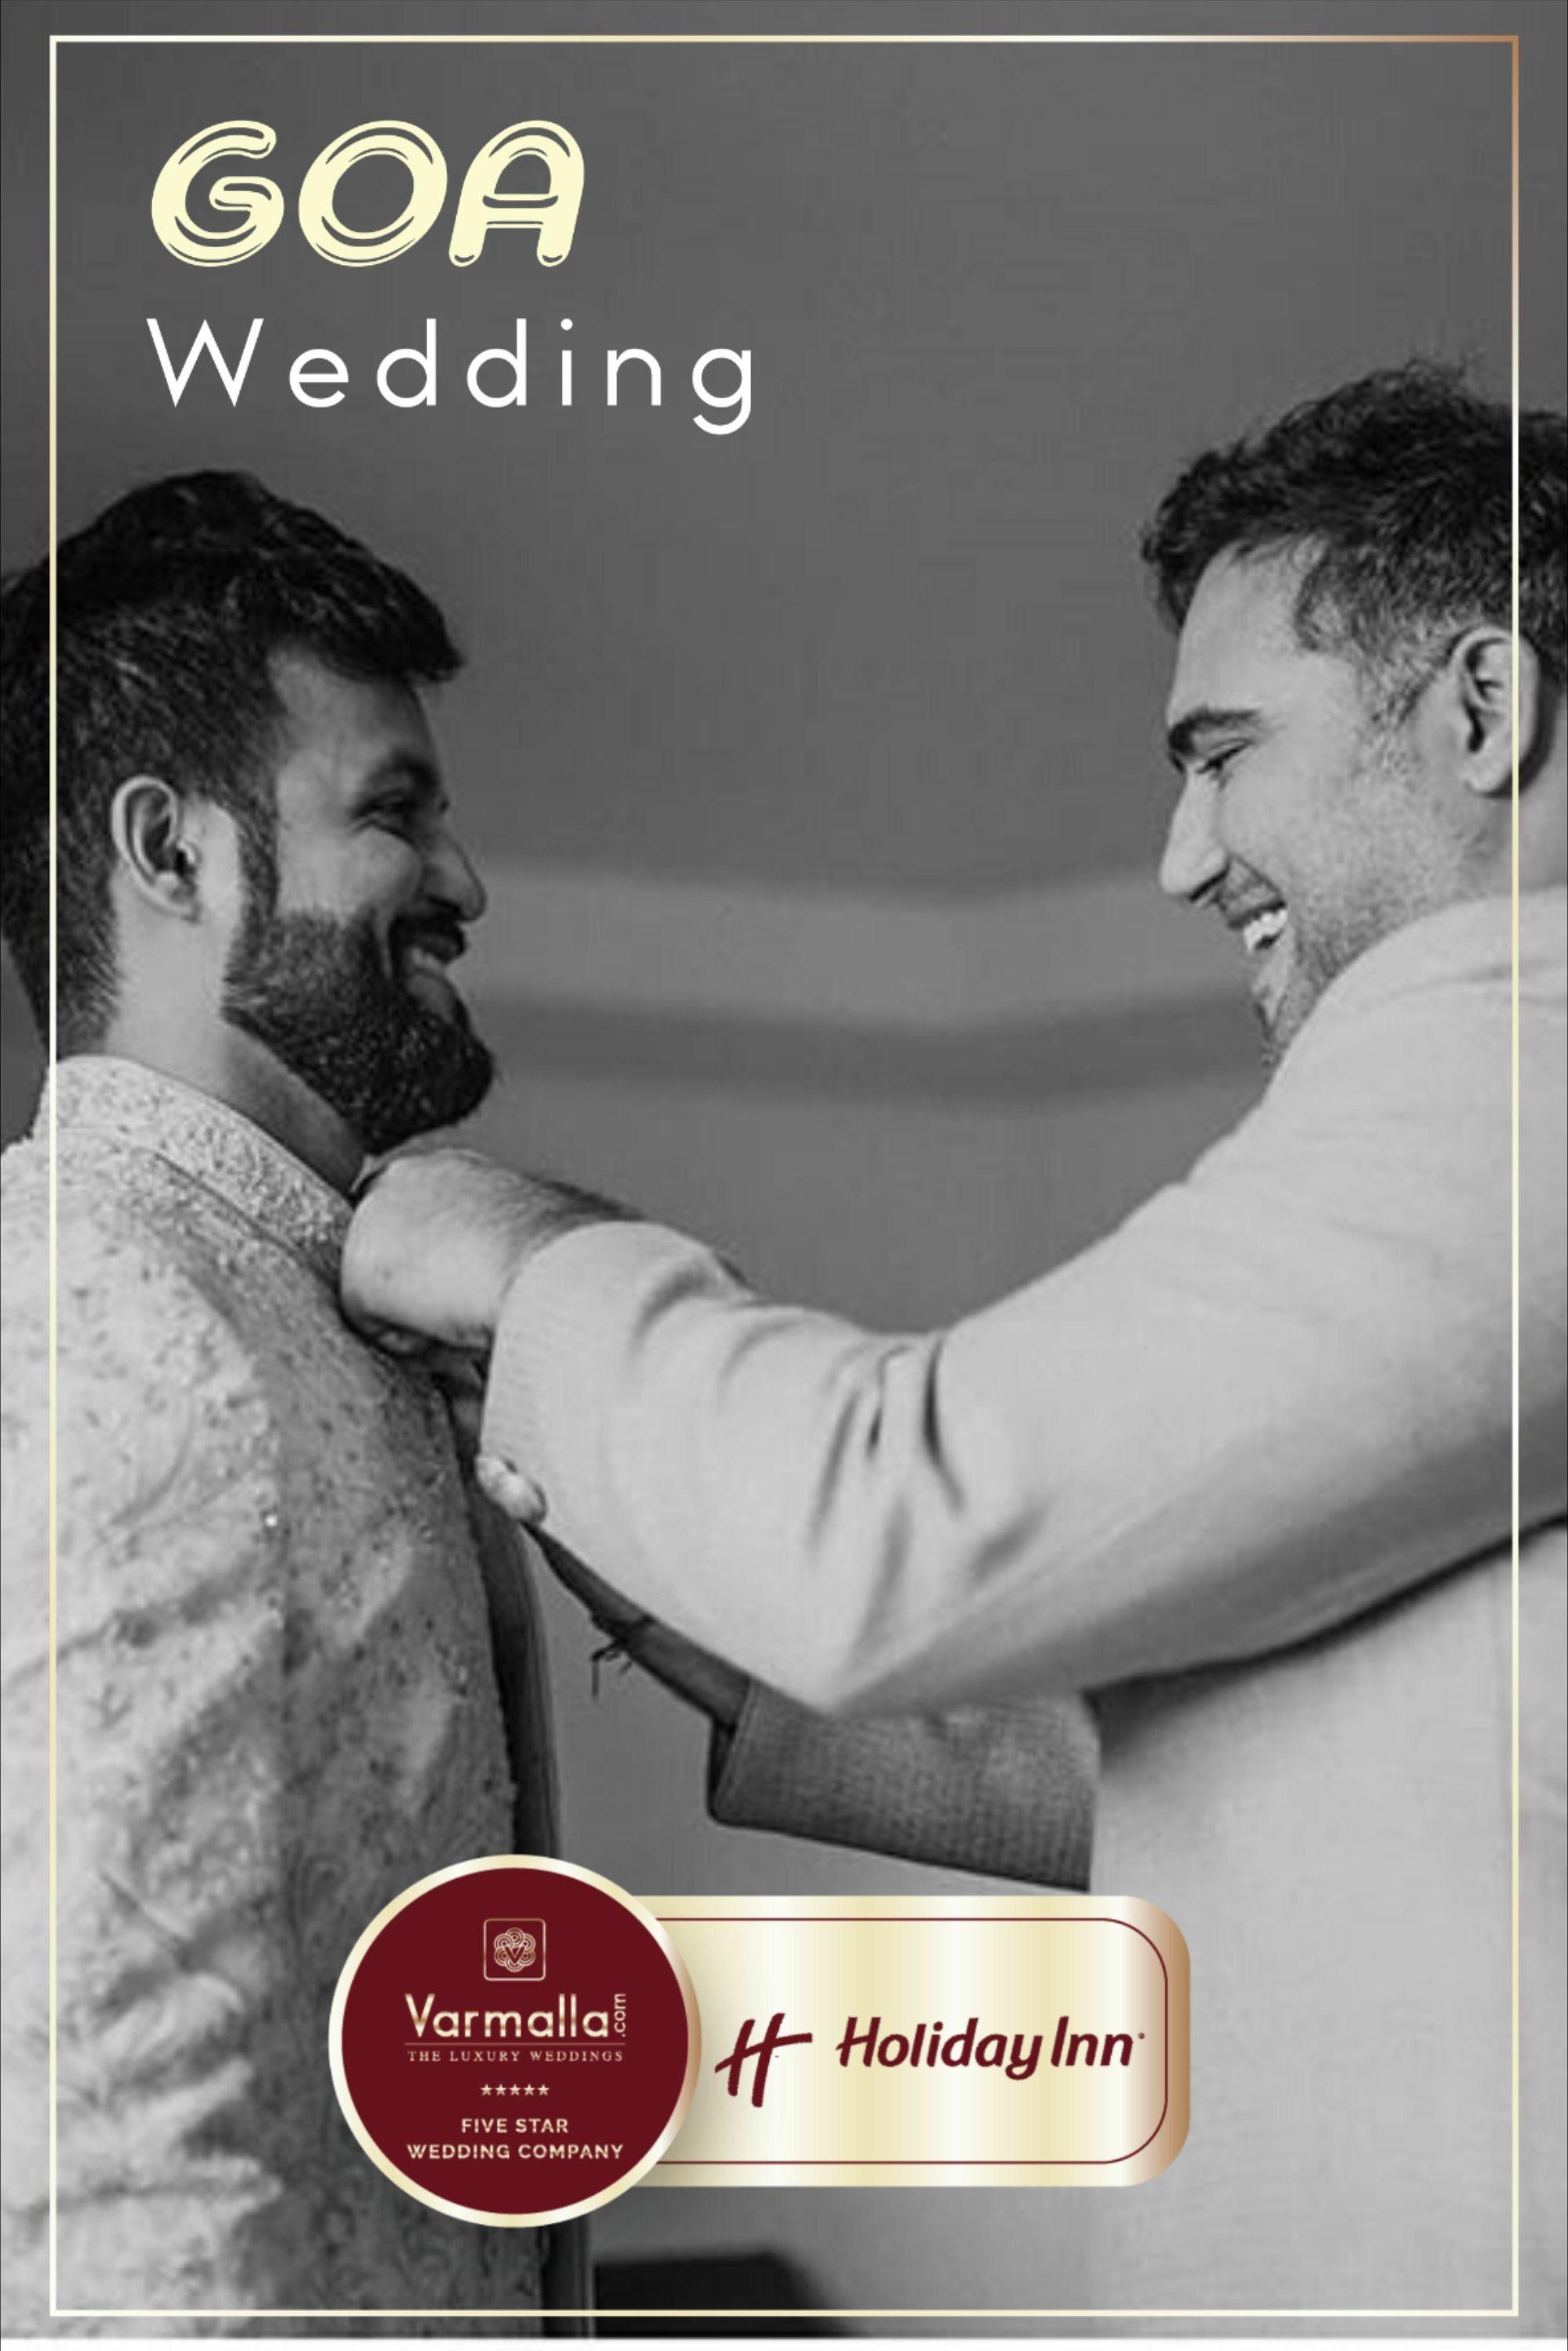 Capture beautiful memories of wedding here...#holidayinngoa #holidayinngoawedding #holidayinnresortgoa #holidayinngoaindia #ramadainn  #ramadahotel #tajmahal #tajpalace #goa #goaindia #goataco #weddinginvitationcards #honeymoon #honeymoonpackages #bridallehenga #bridalmakeup #bridalmehndidesign #bridalmehndi #Bridalsaree #bridaljewellery #bride #indianbride #bridegroom #eventmanagement #weddingplanner #weddinginvitationcards #destination #destinationwedding #weddingdecorations#weddinggift